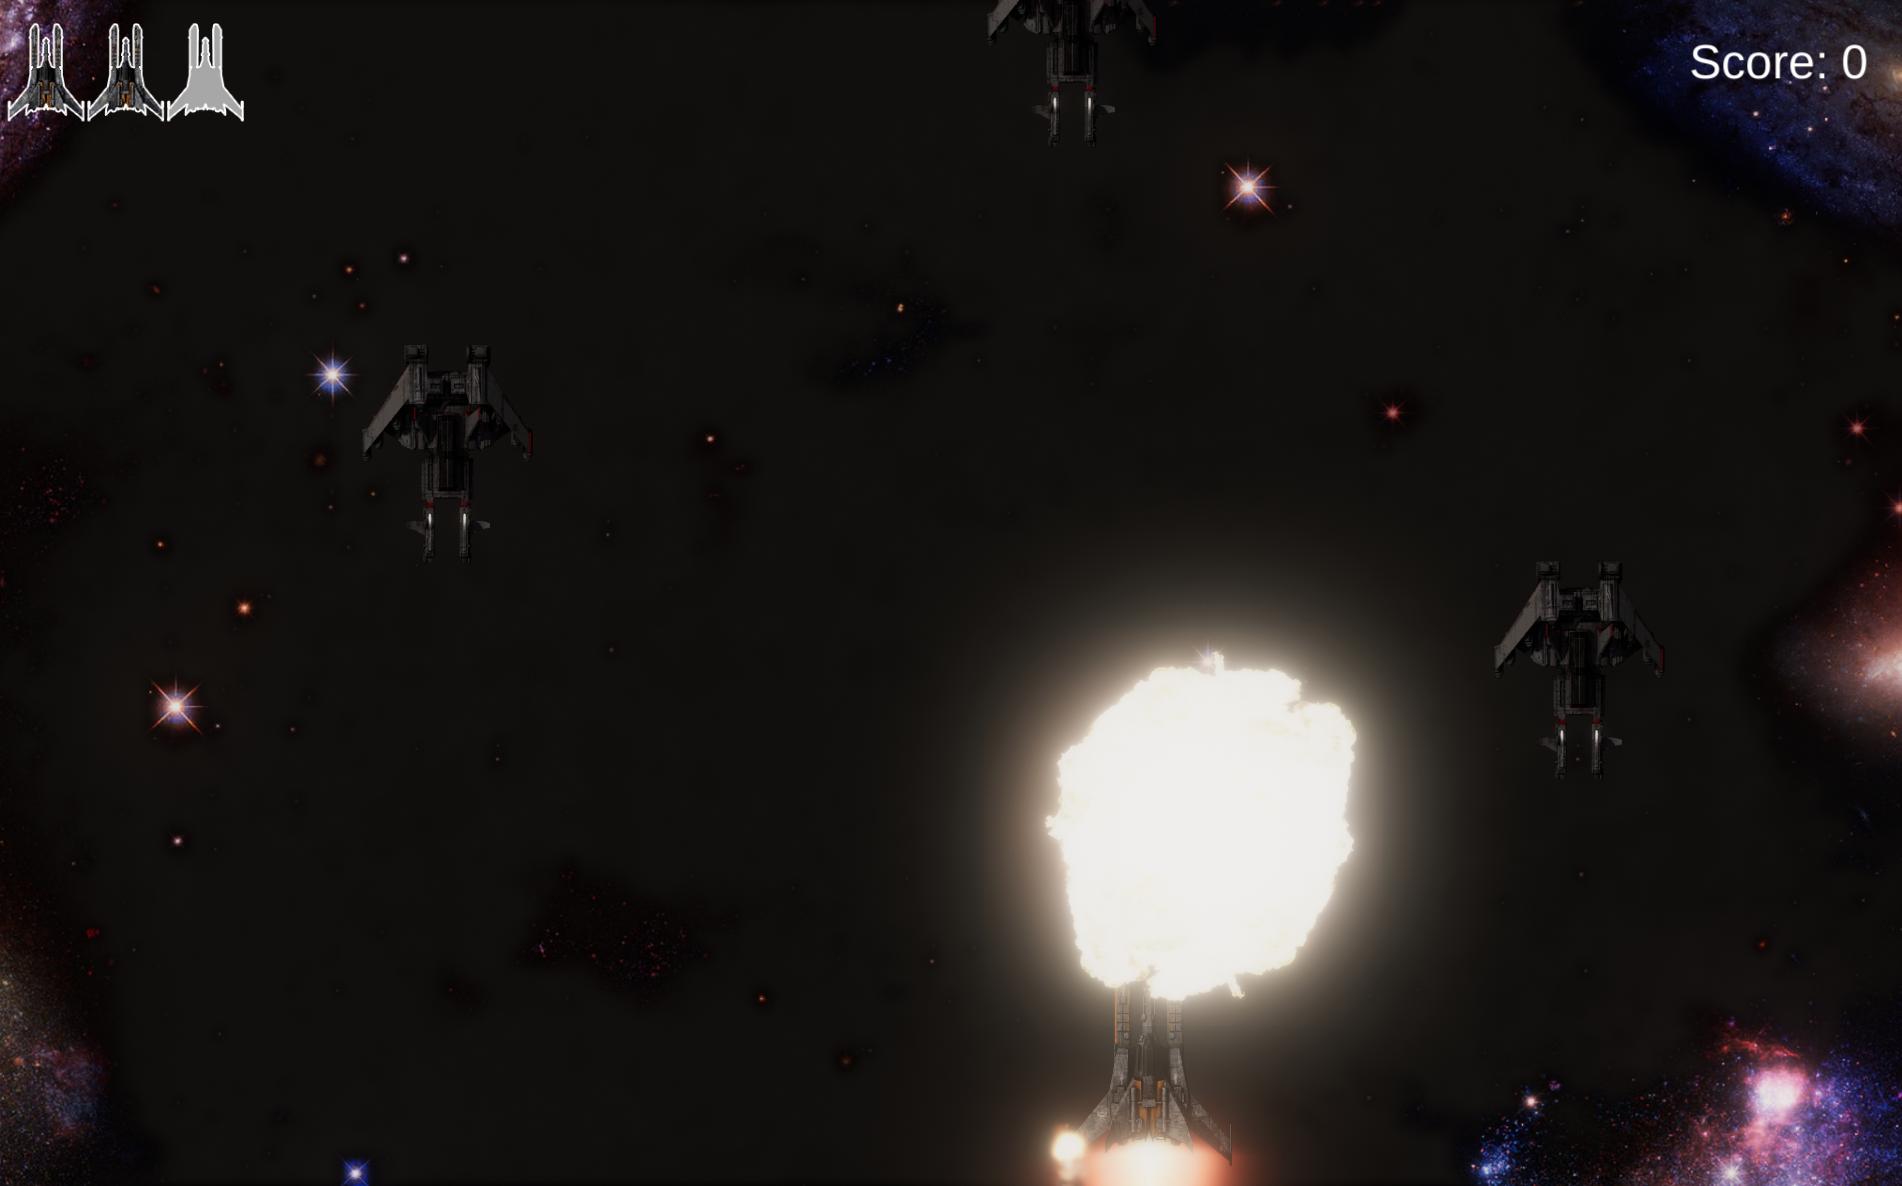 Galaxy Shooter screenshot